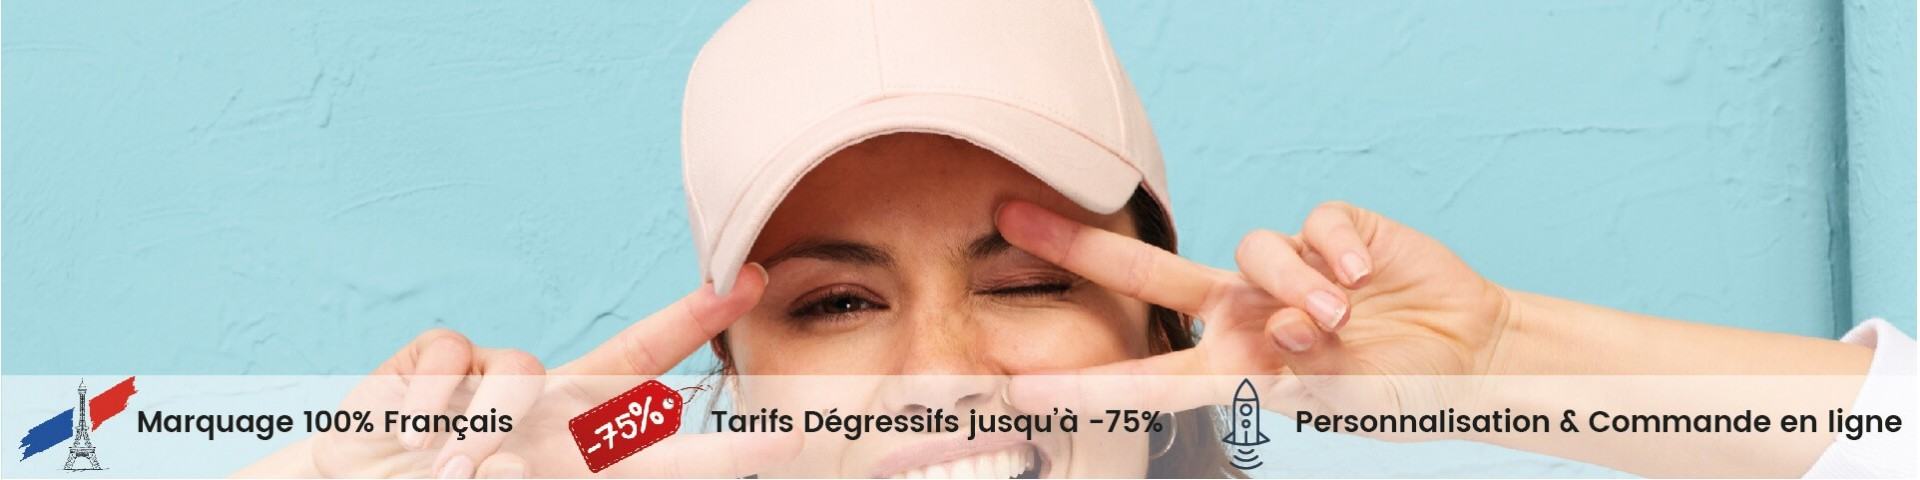 Casquette Personnalisable - Tarifs Dégressifs jusqu'à -75% - Broderie